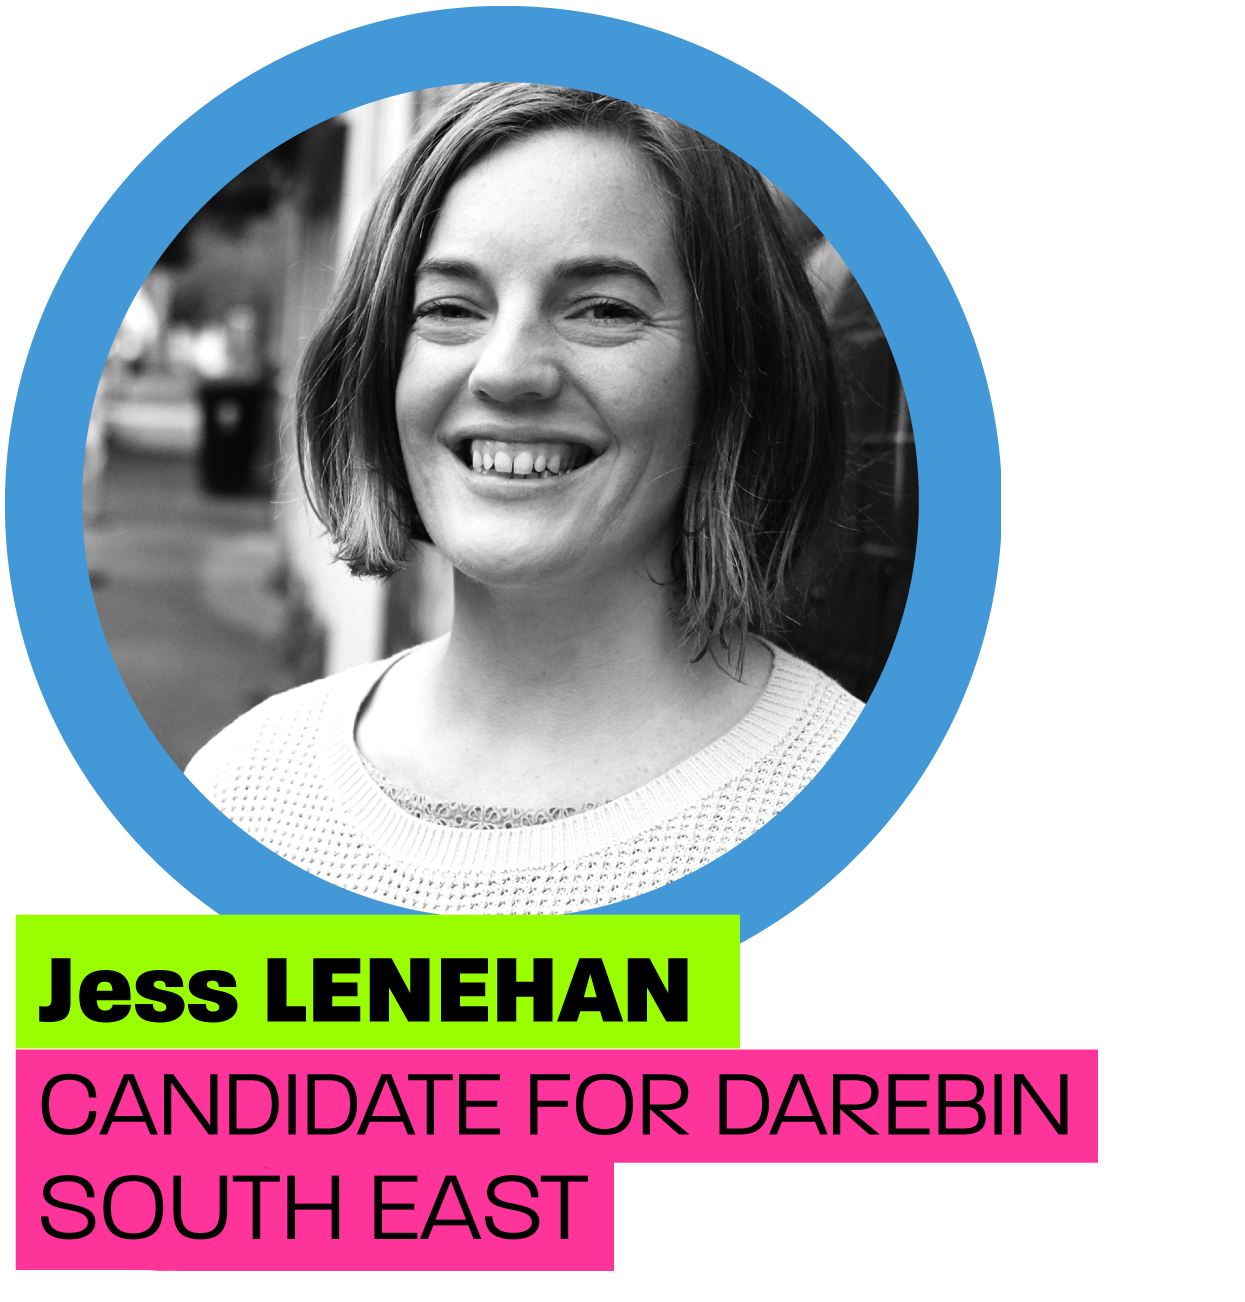 Jess Lenehan